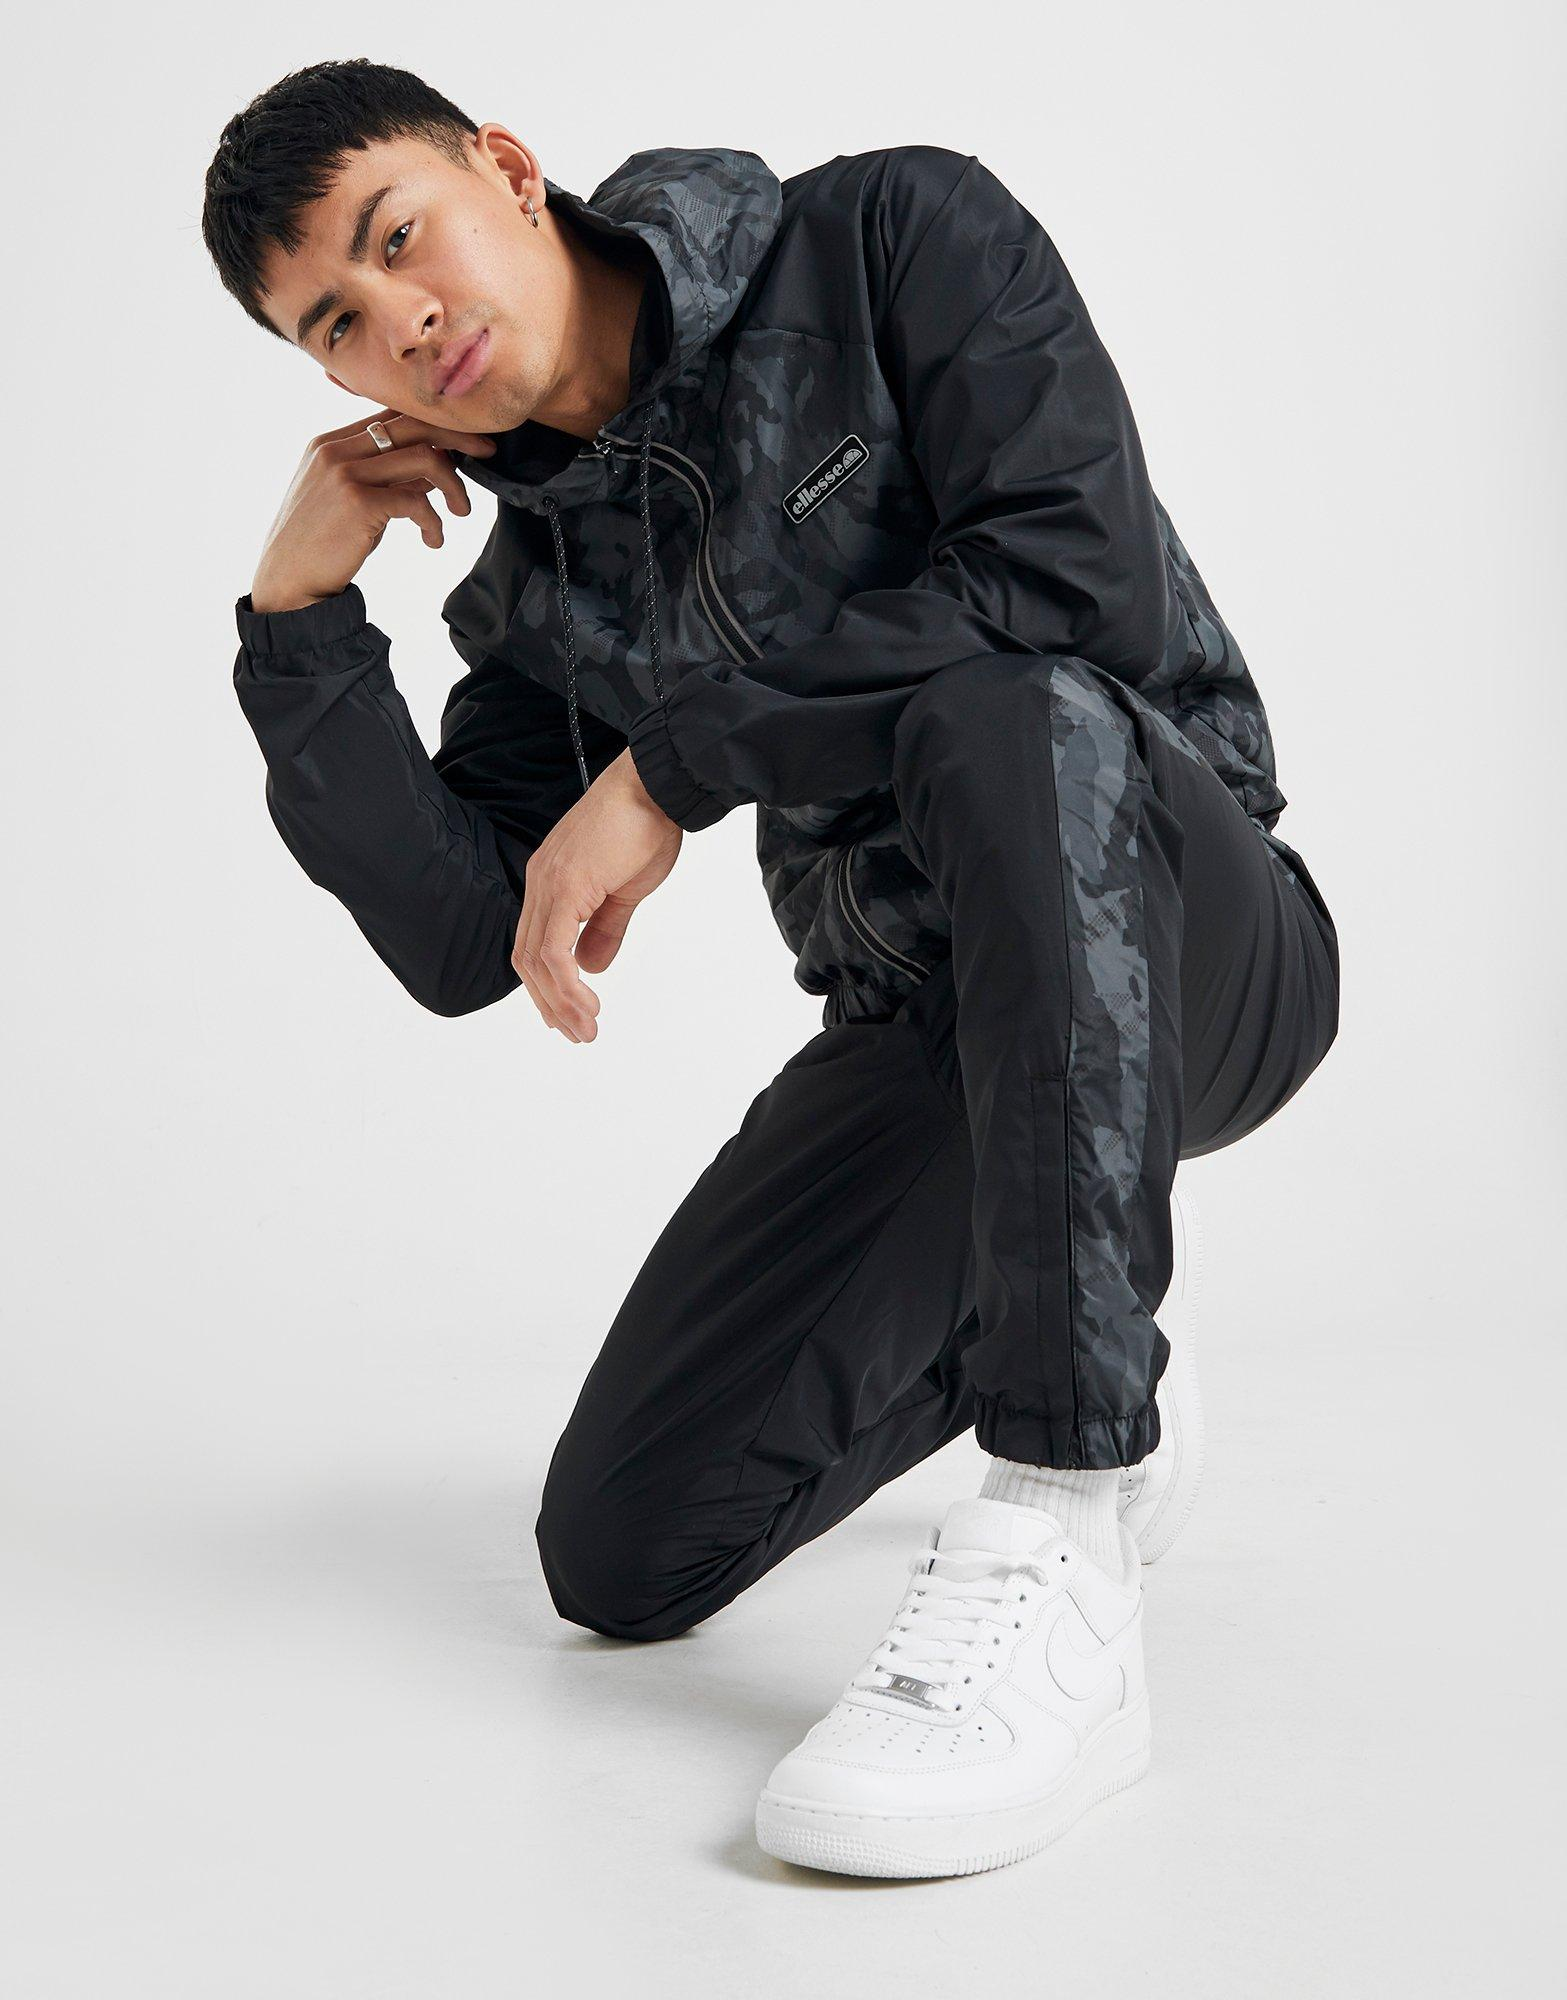 Acheter Black Ellesse Survêtement Zito Woven Homme | JD Sports